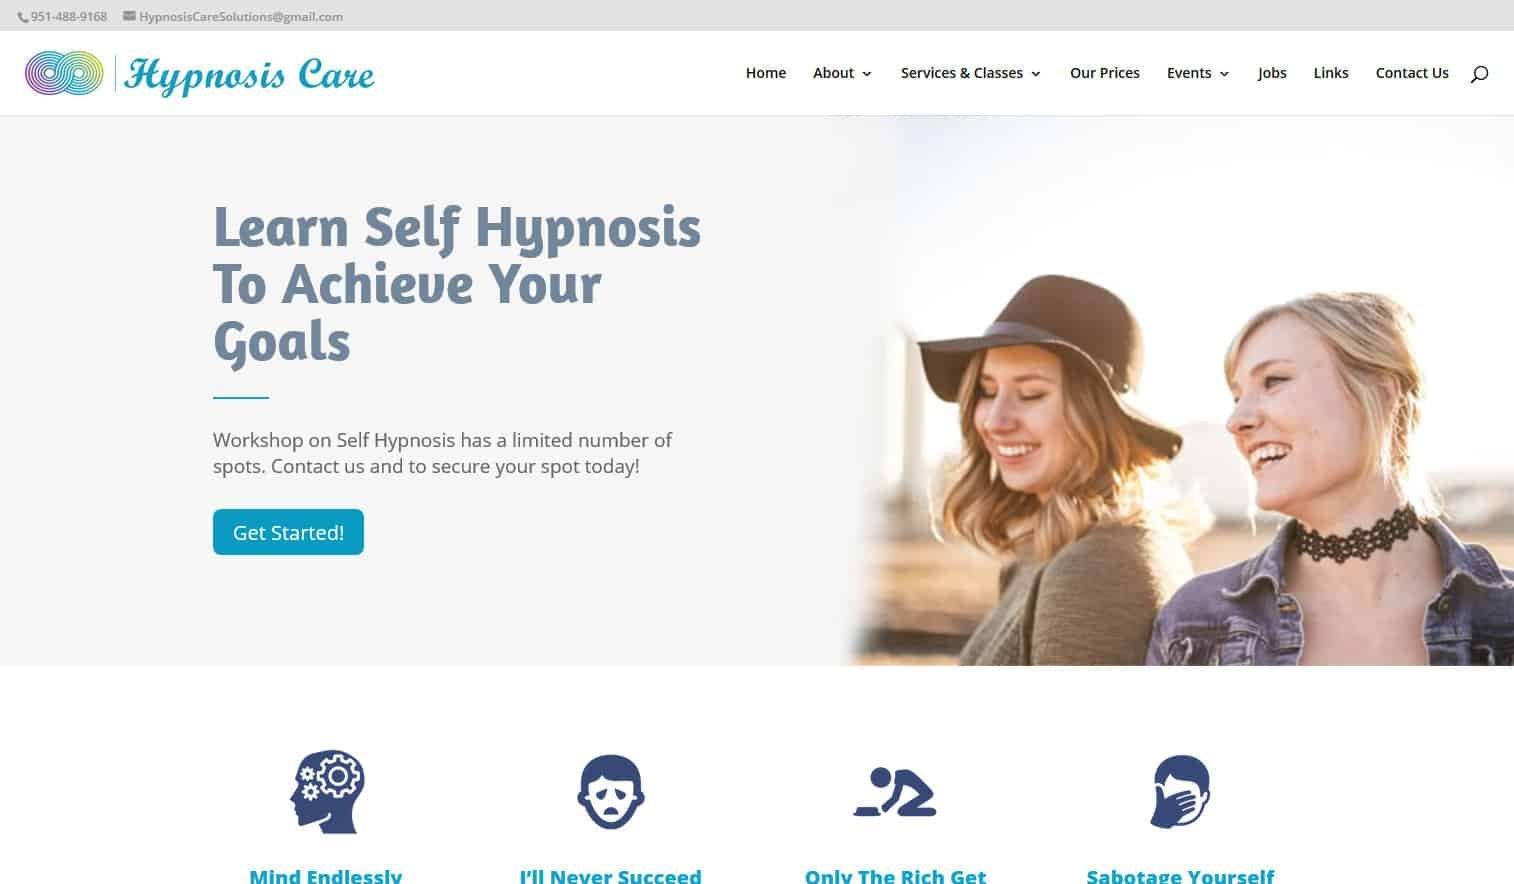 hypnosisCare2